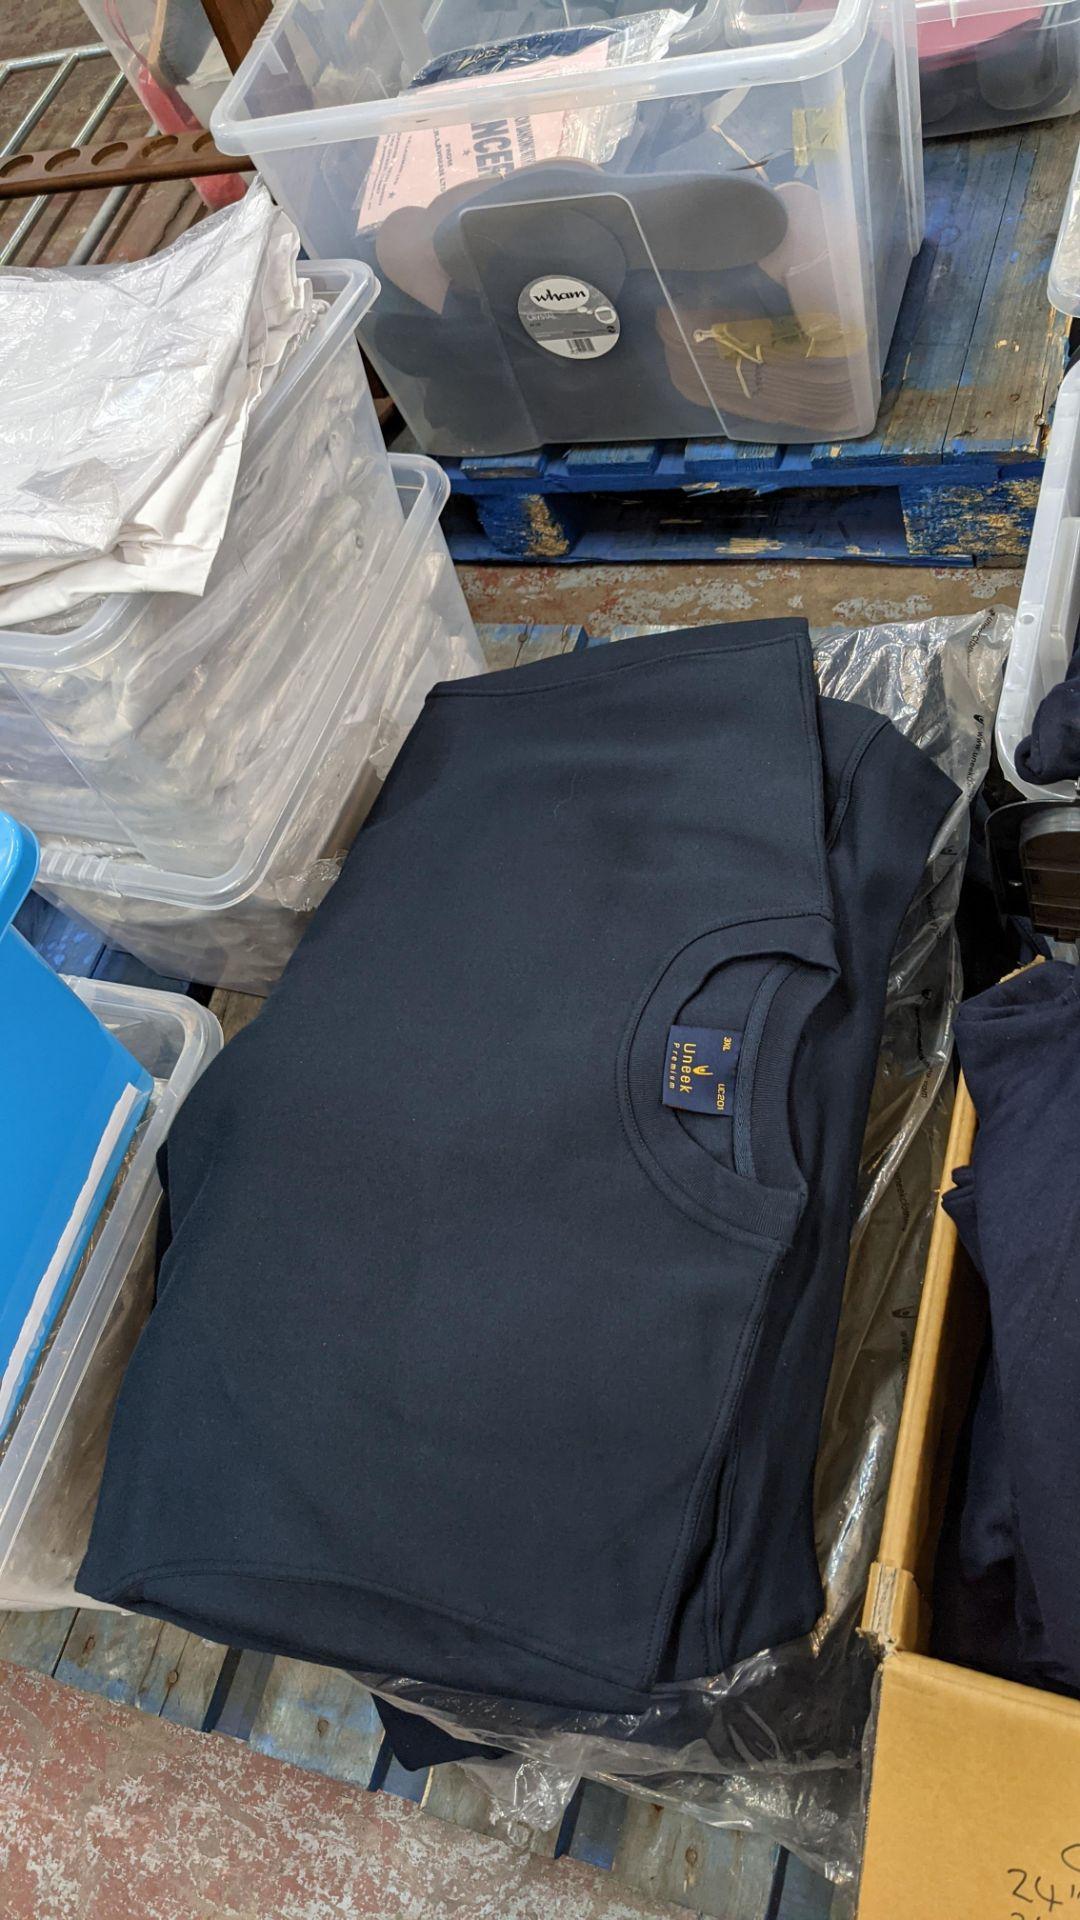 Approx 15 off Uneek dark blue sweatshirts - 2 bags - Image 5 of 5